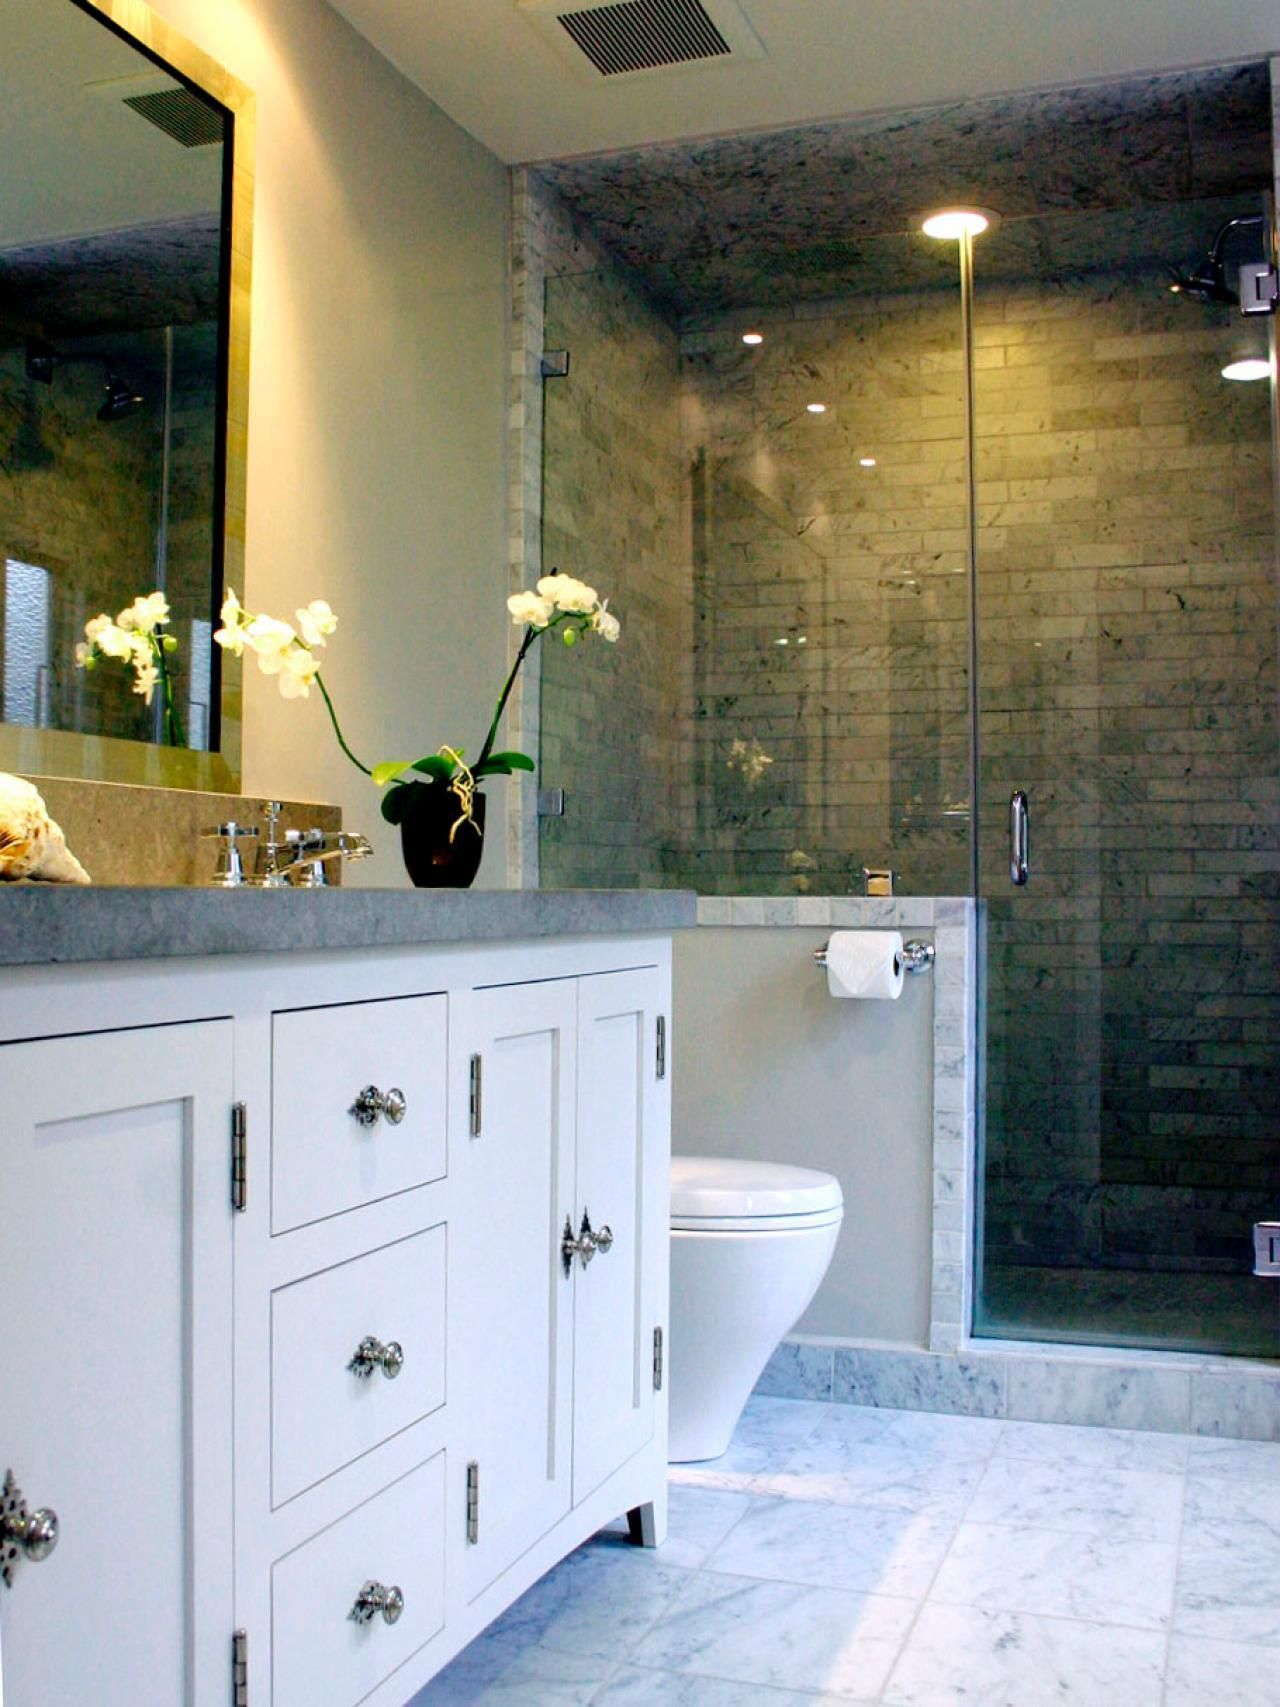 Three Quarter Bathrooms Bathroom Design Choose Floor Plan Bath Remodeling Materials Hgtv Dizajn Vannoj Interer Dizajn